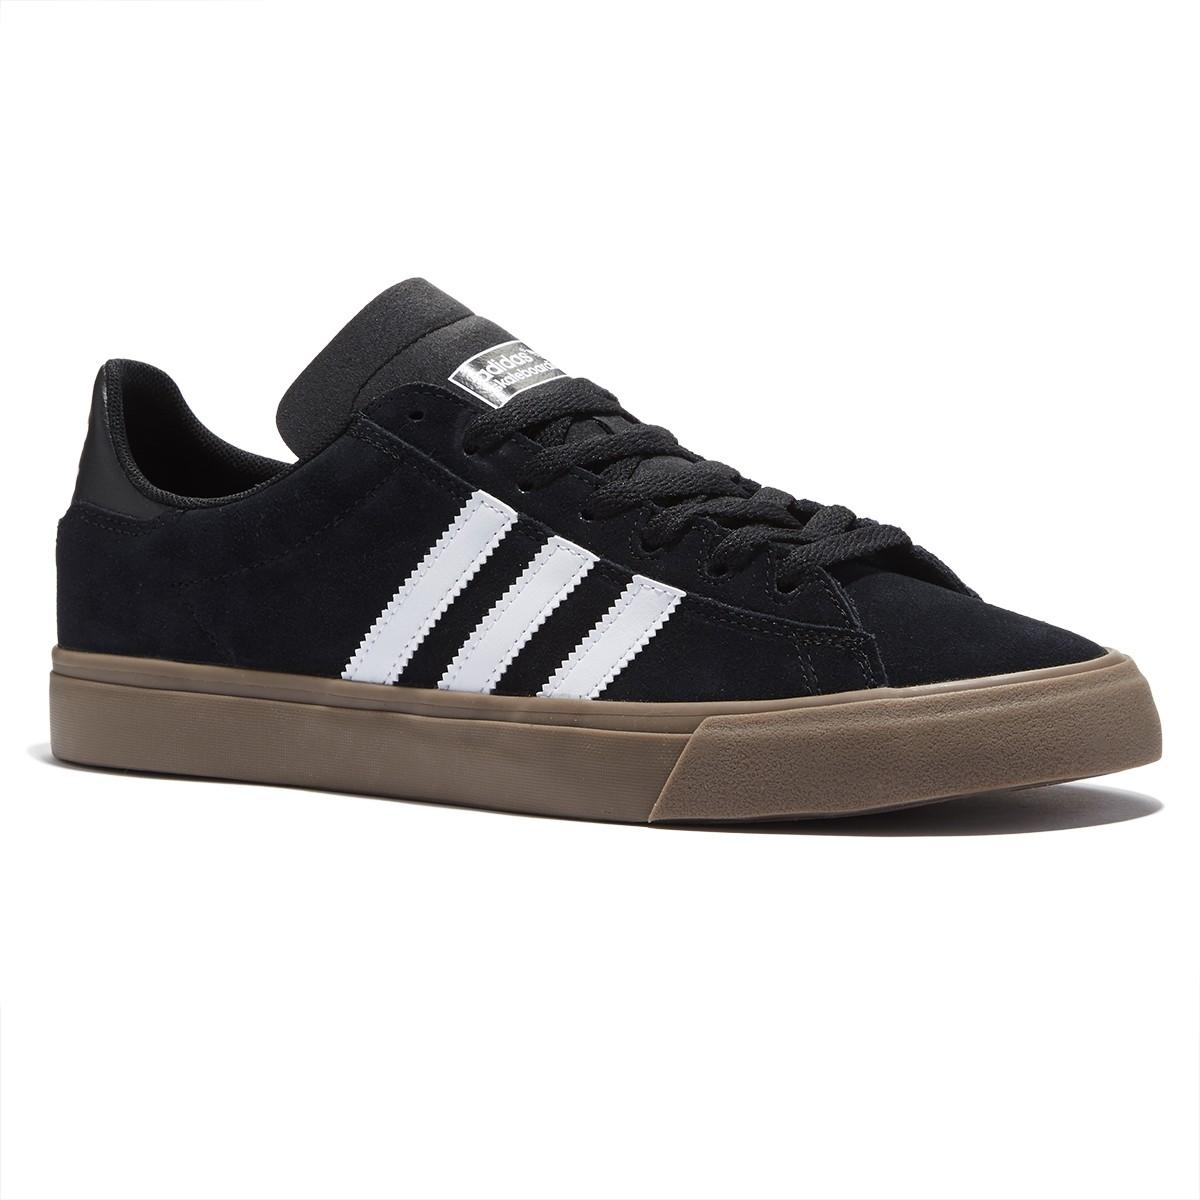 adidas campus vulc ii shoes - black/white/gum - 8.0 AQIFXRN